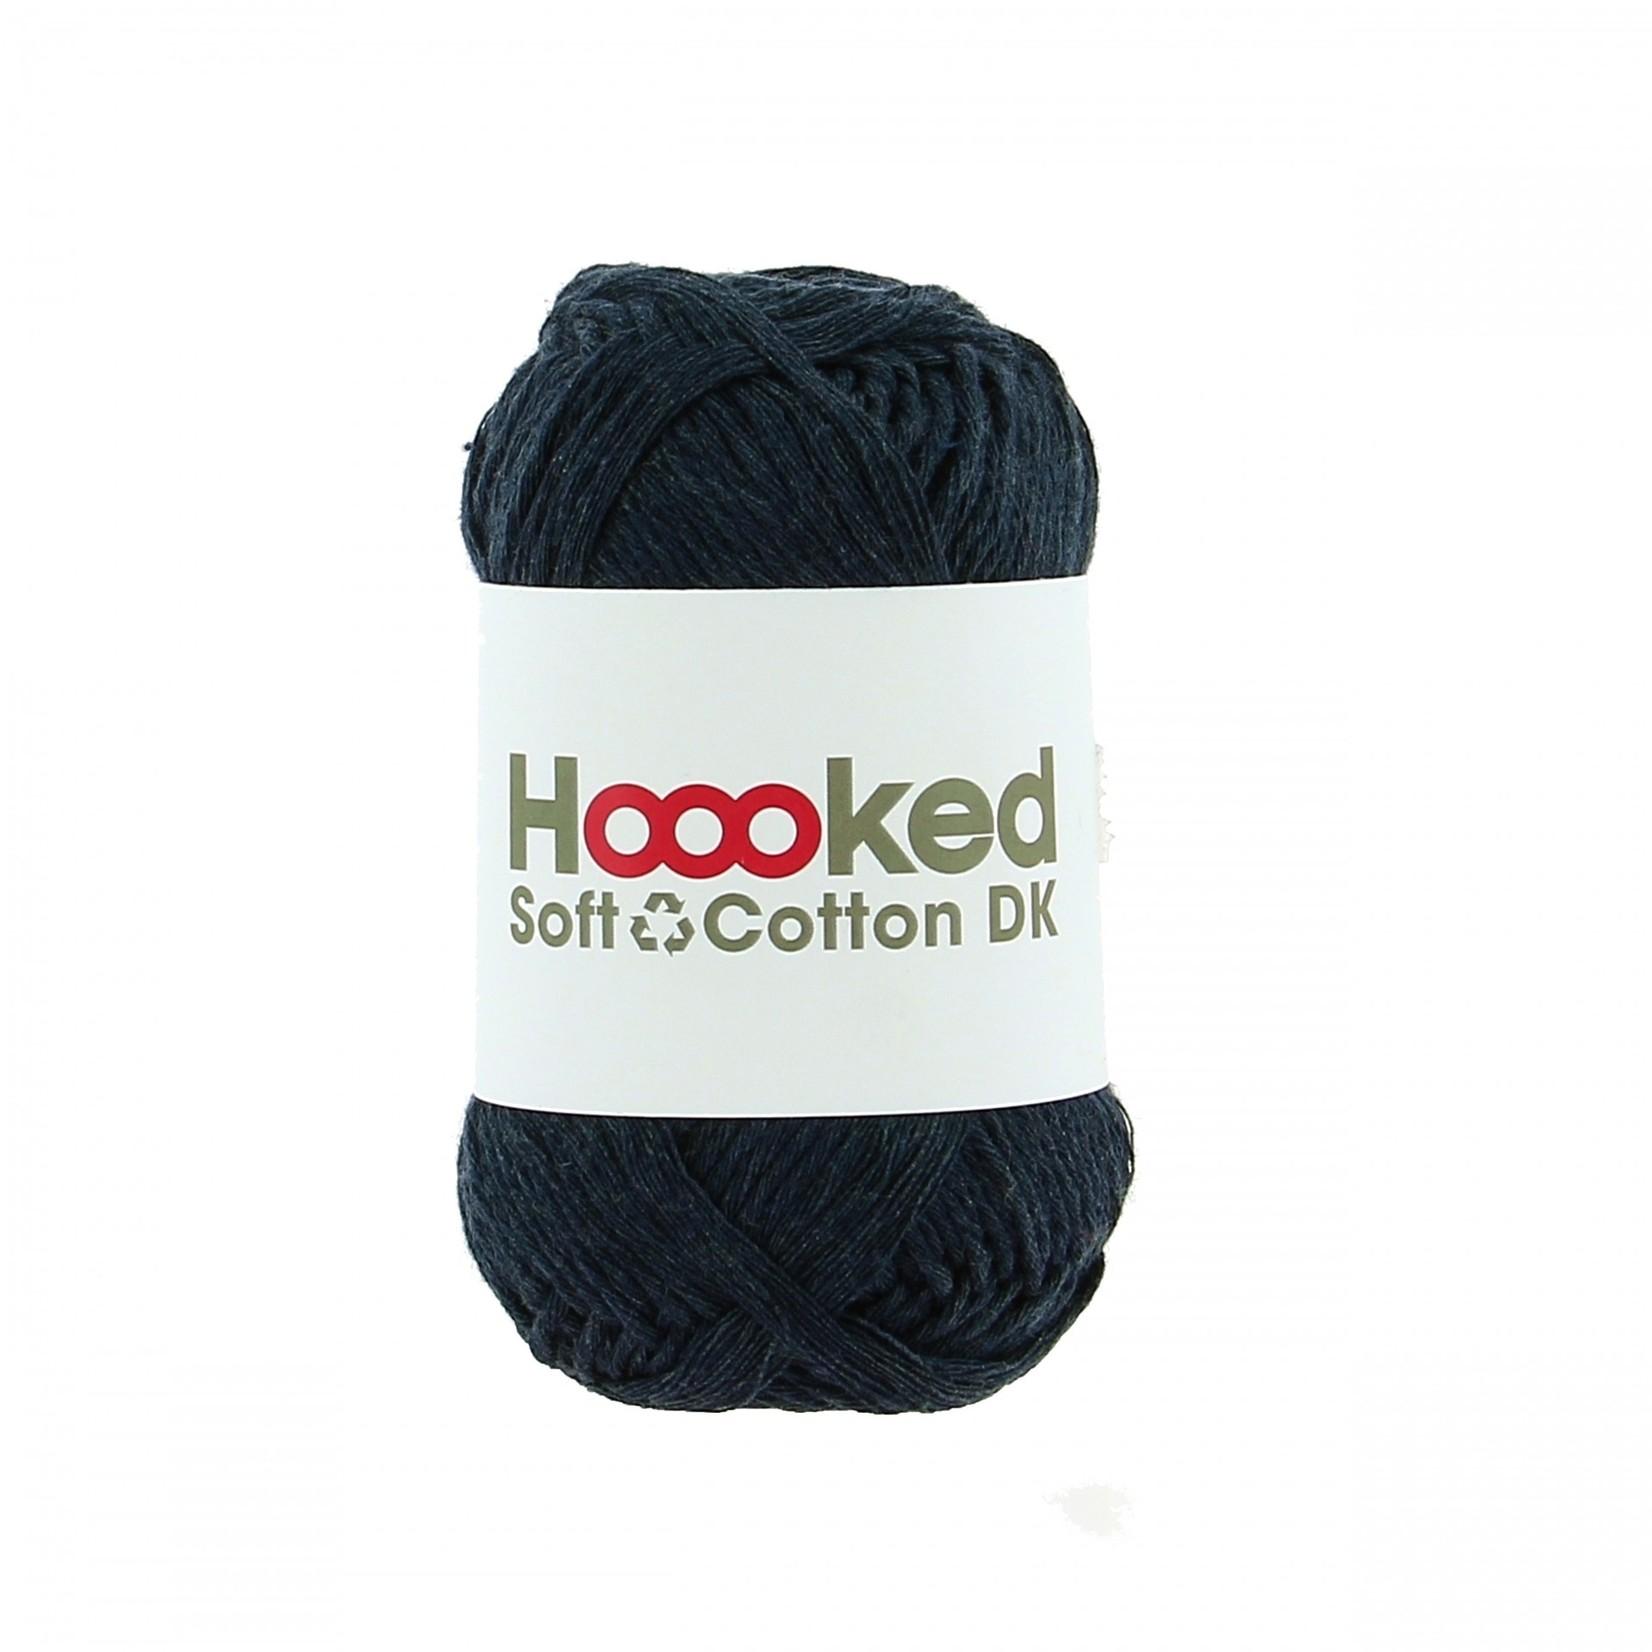 Hoooked Hoooked Soft Cotton DK Paris Jeans 50 gr. / 85 m.